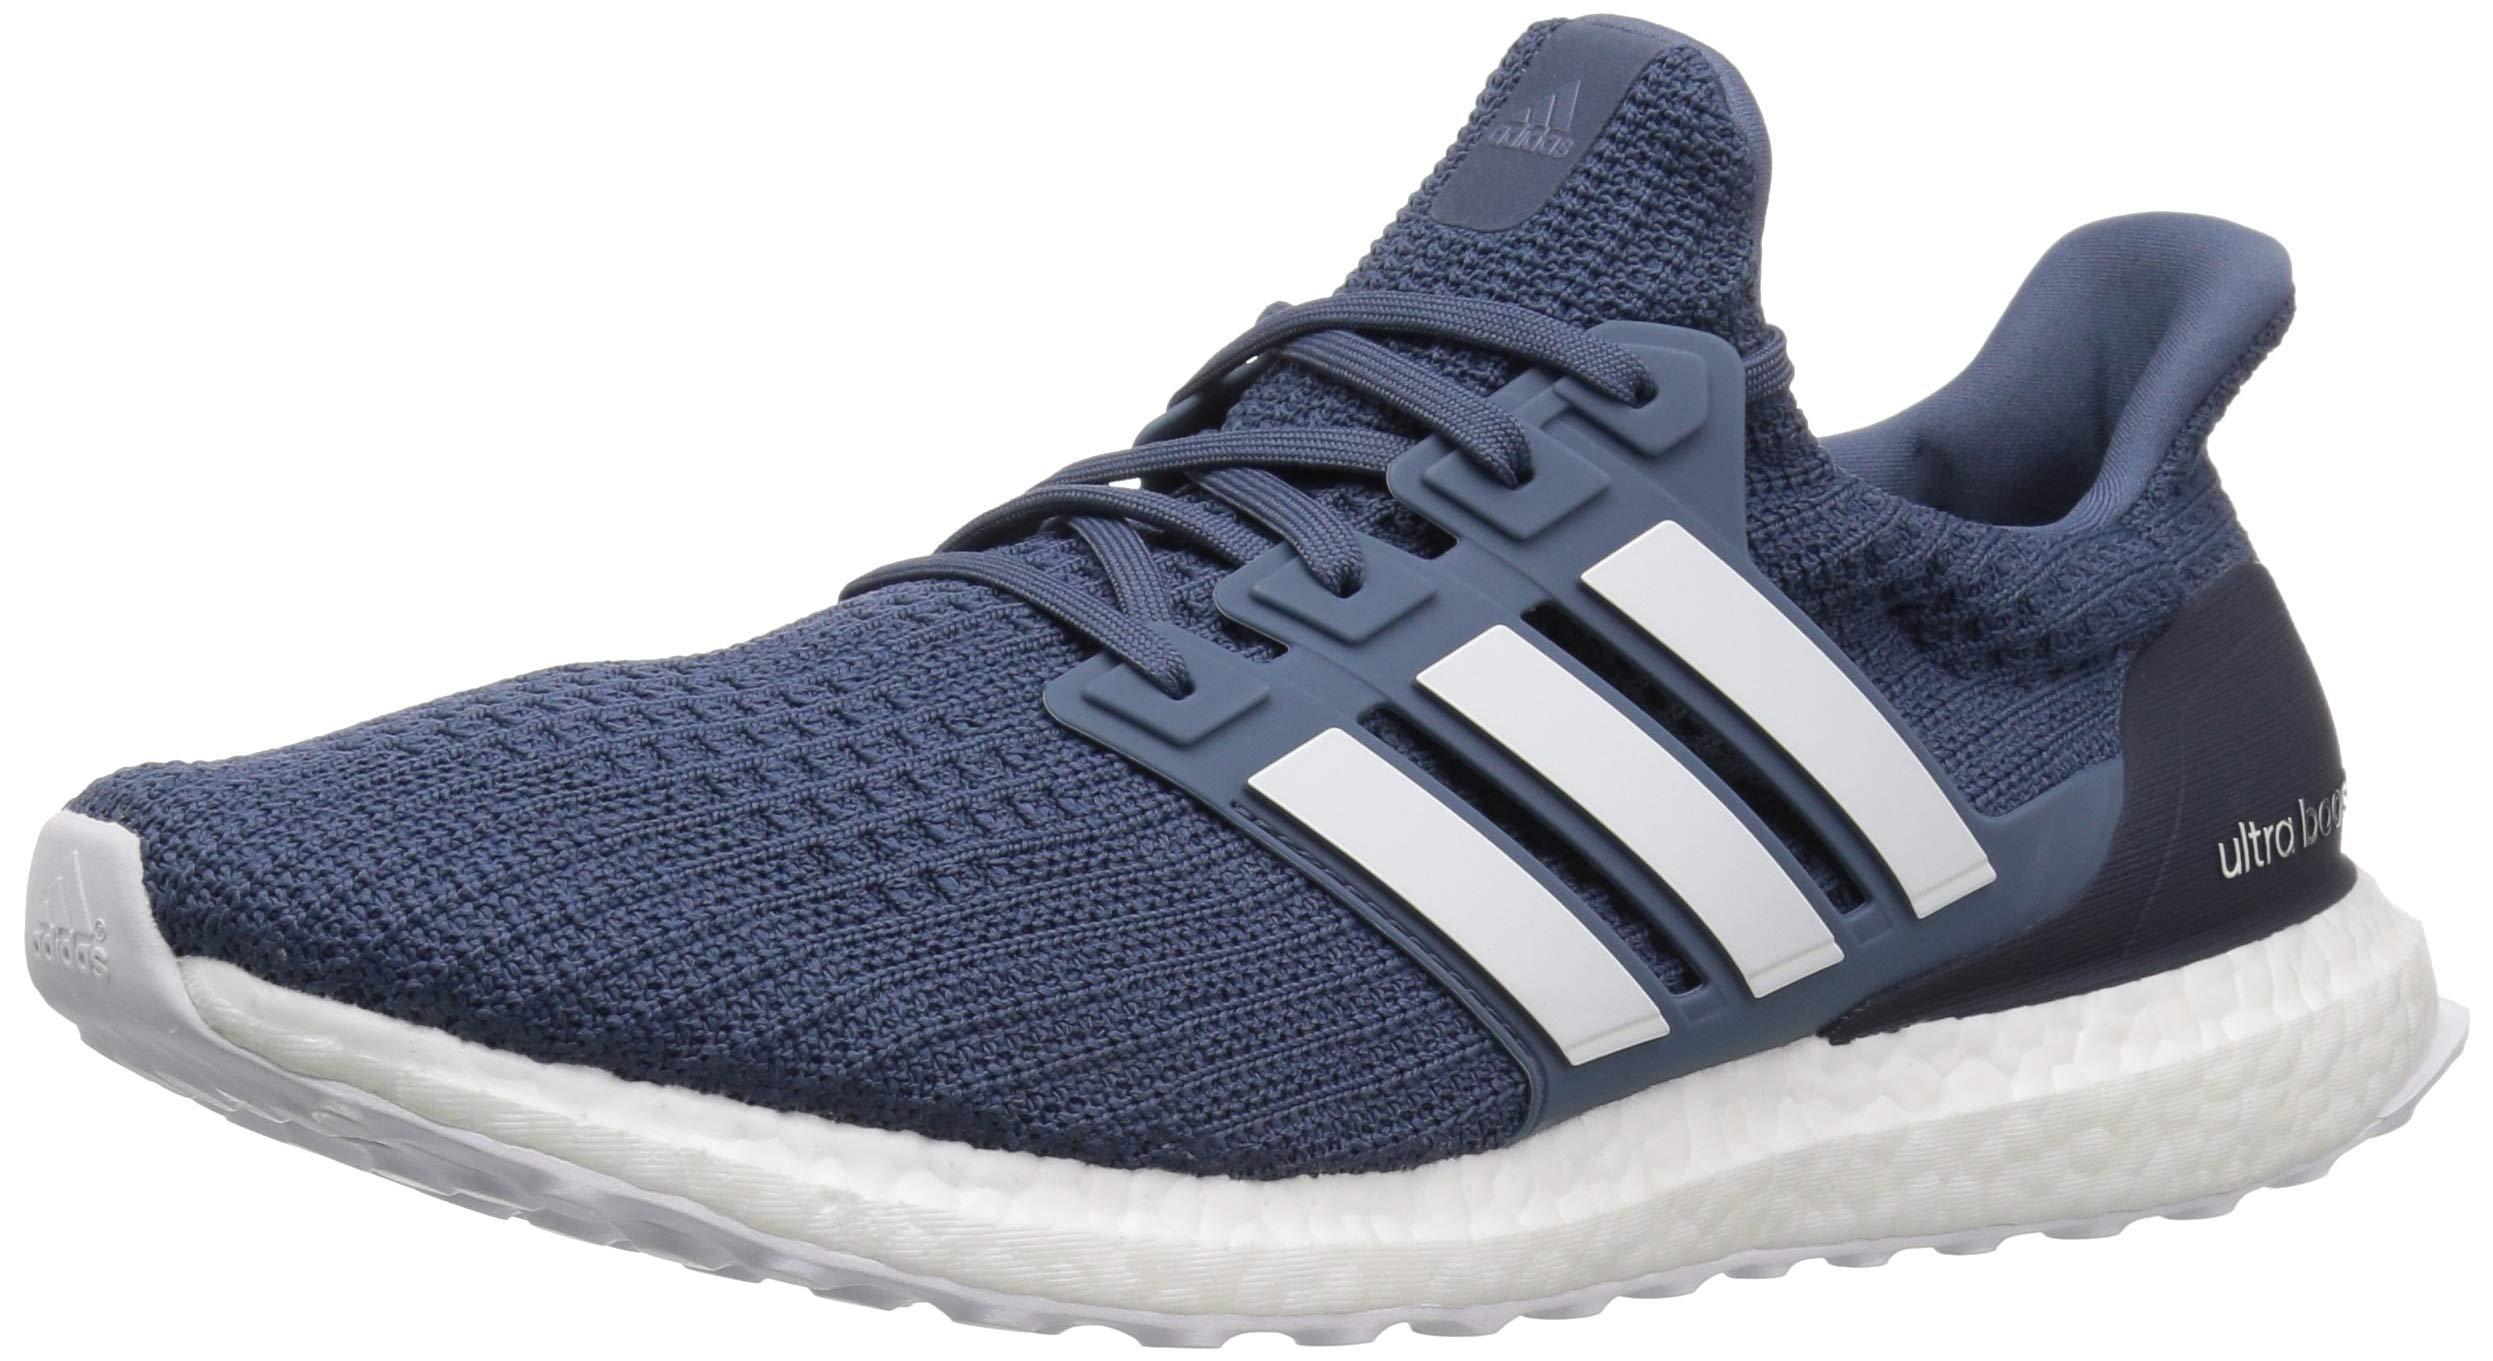 hot sale online 77b4f 0a5d4 Galleon - Adidas Men s Ultraboost Running Shoe, Tech Ink Cloud White Vapour  Grey, 13 M US